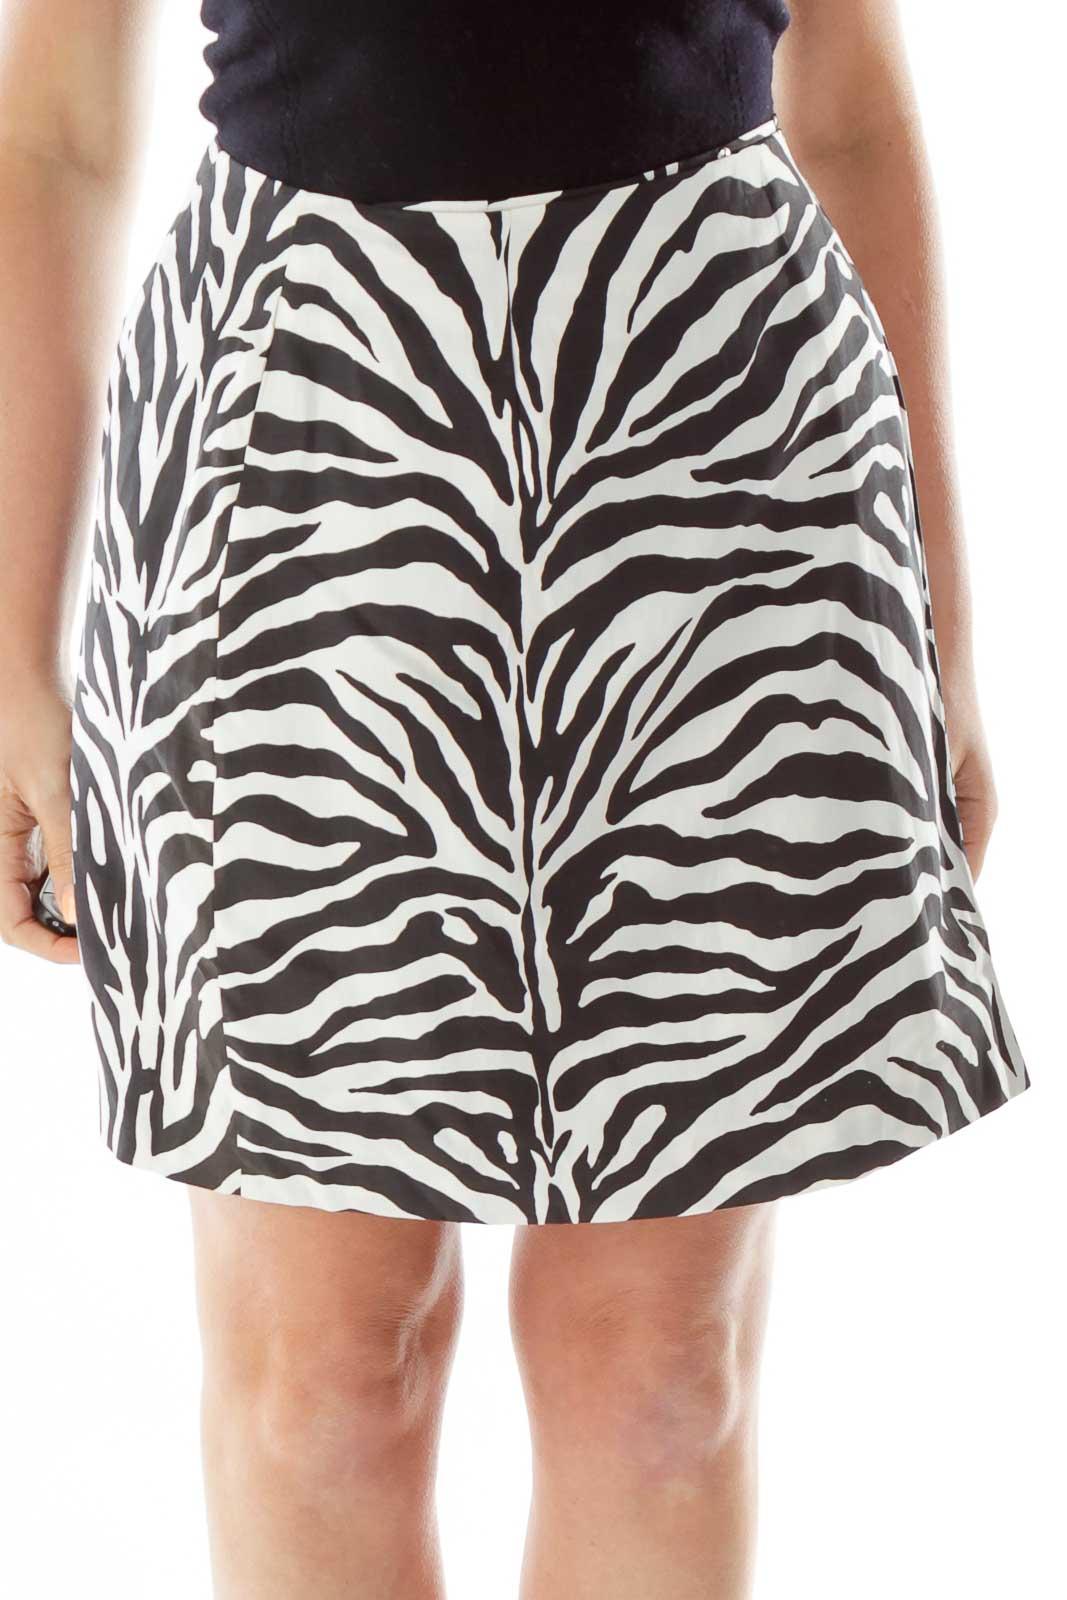 Black White Zebra Wrap Pencil Skirt